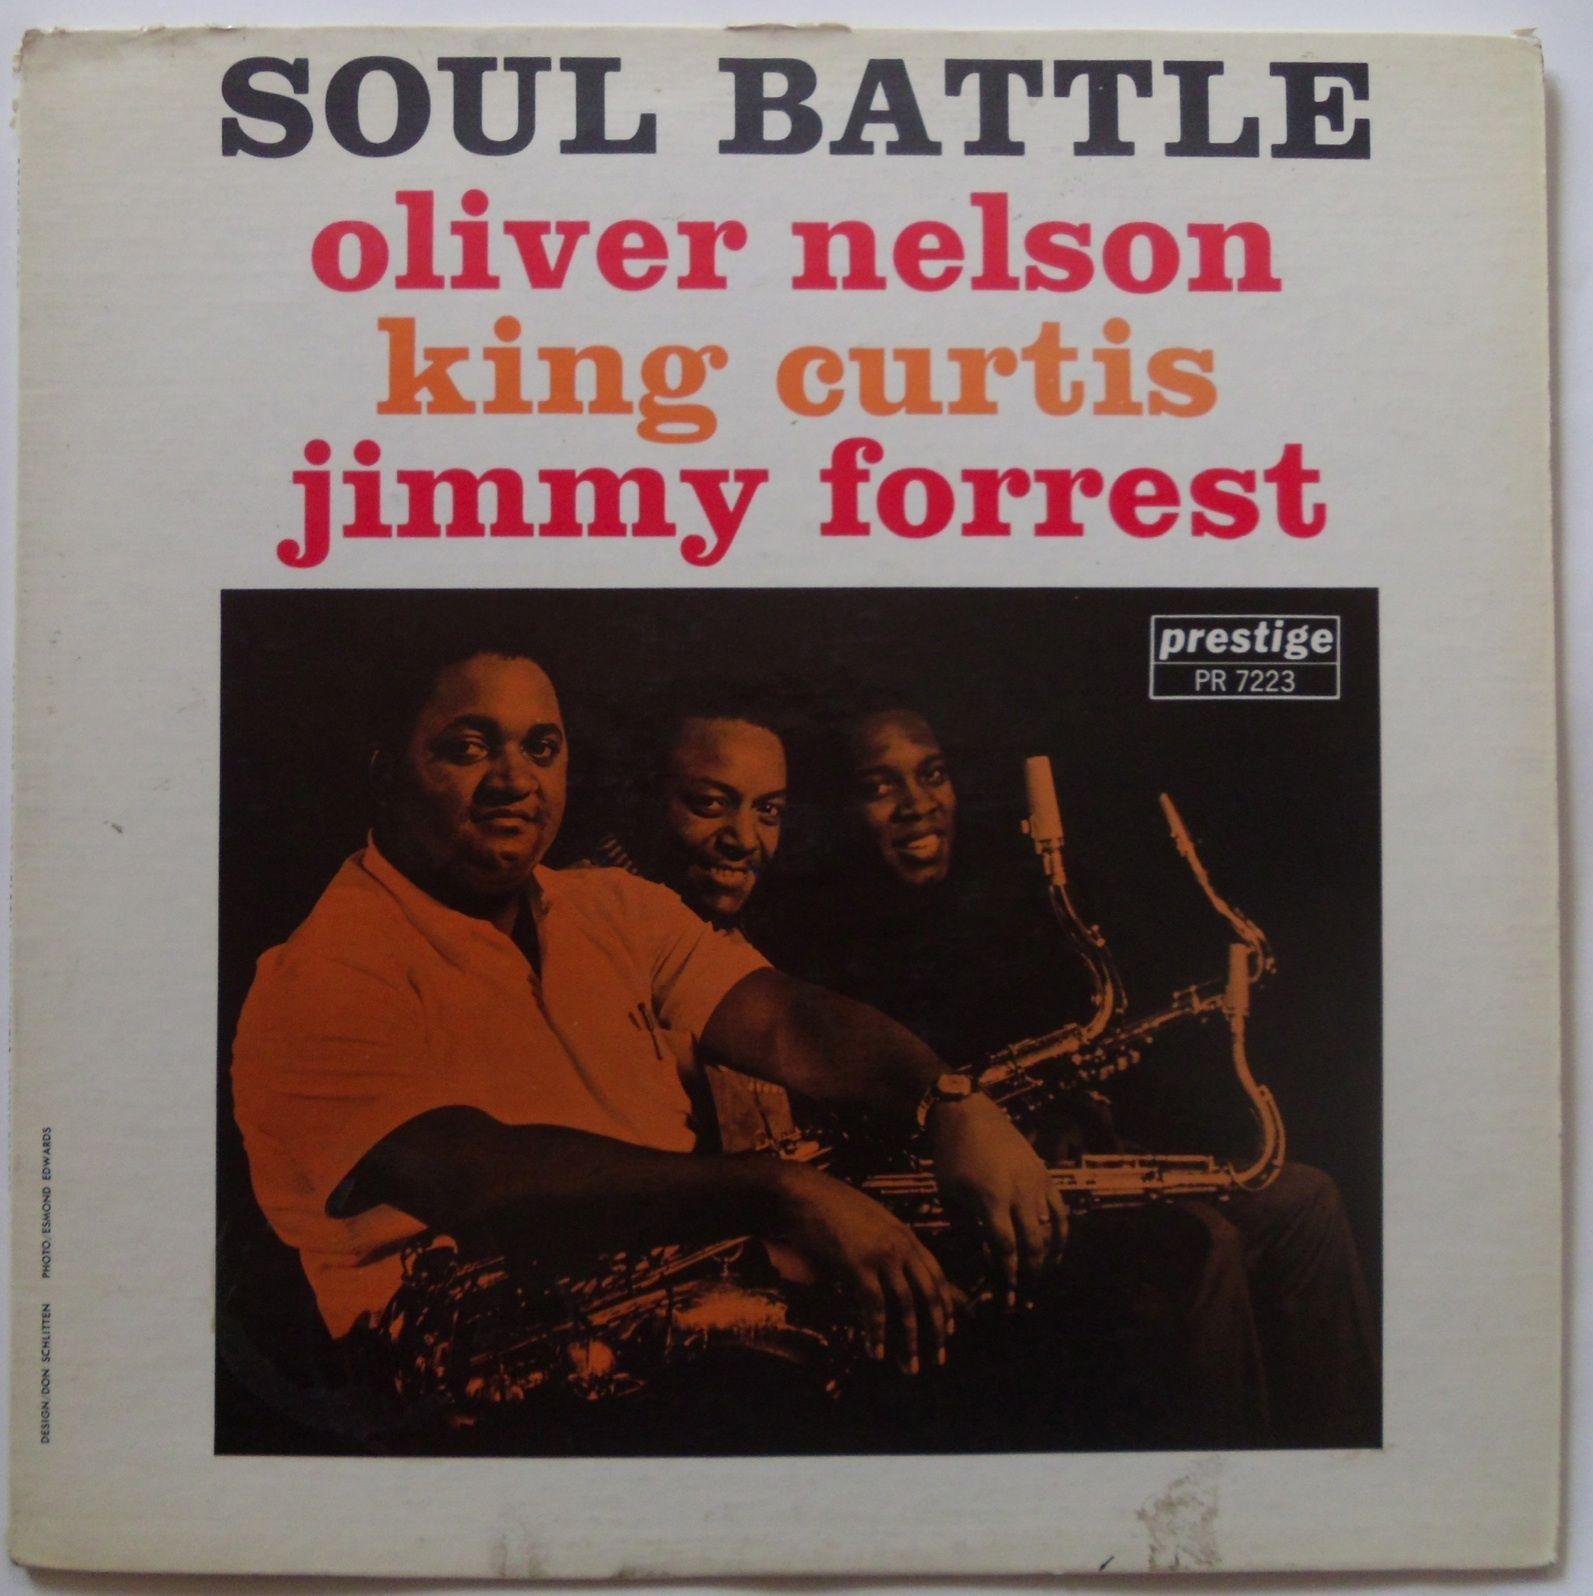 OLIVER NELSON - Soul Battle cover